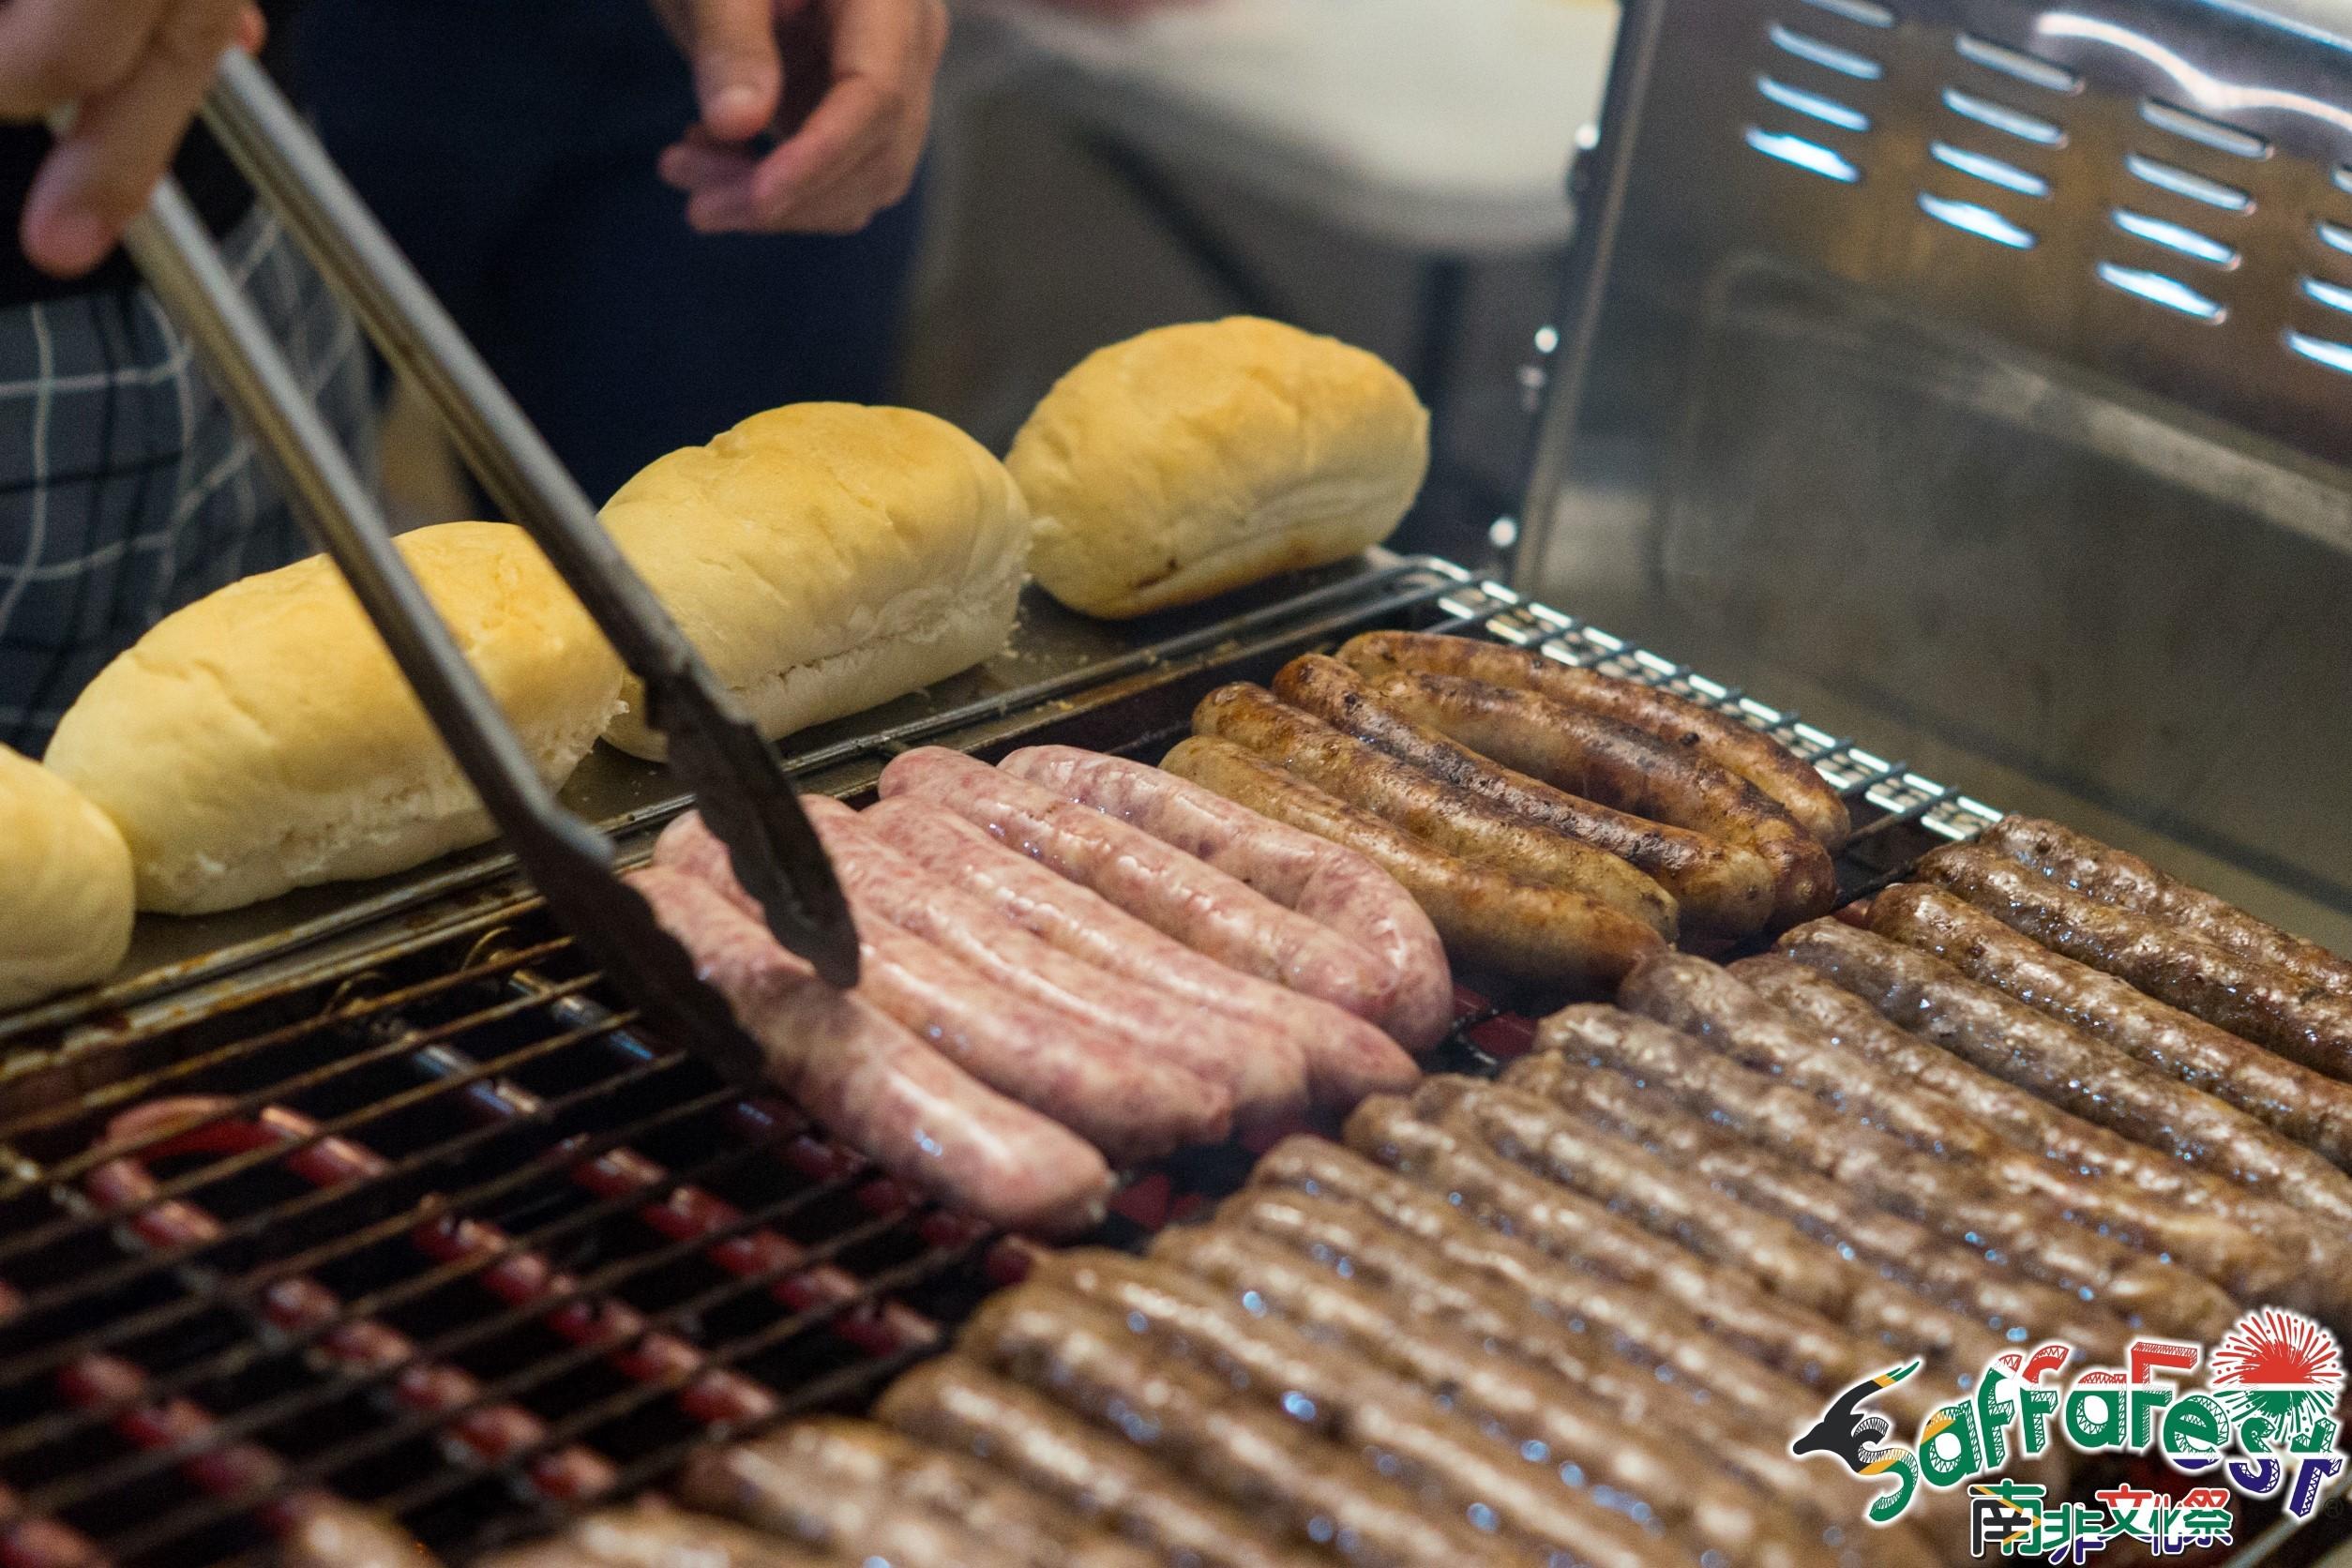 Vendors sausages